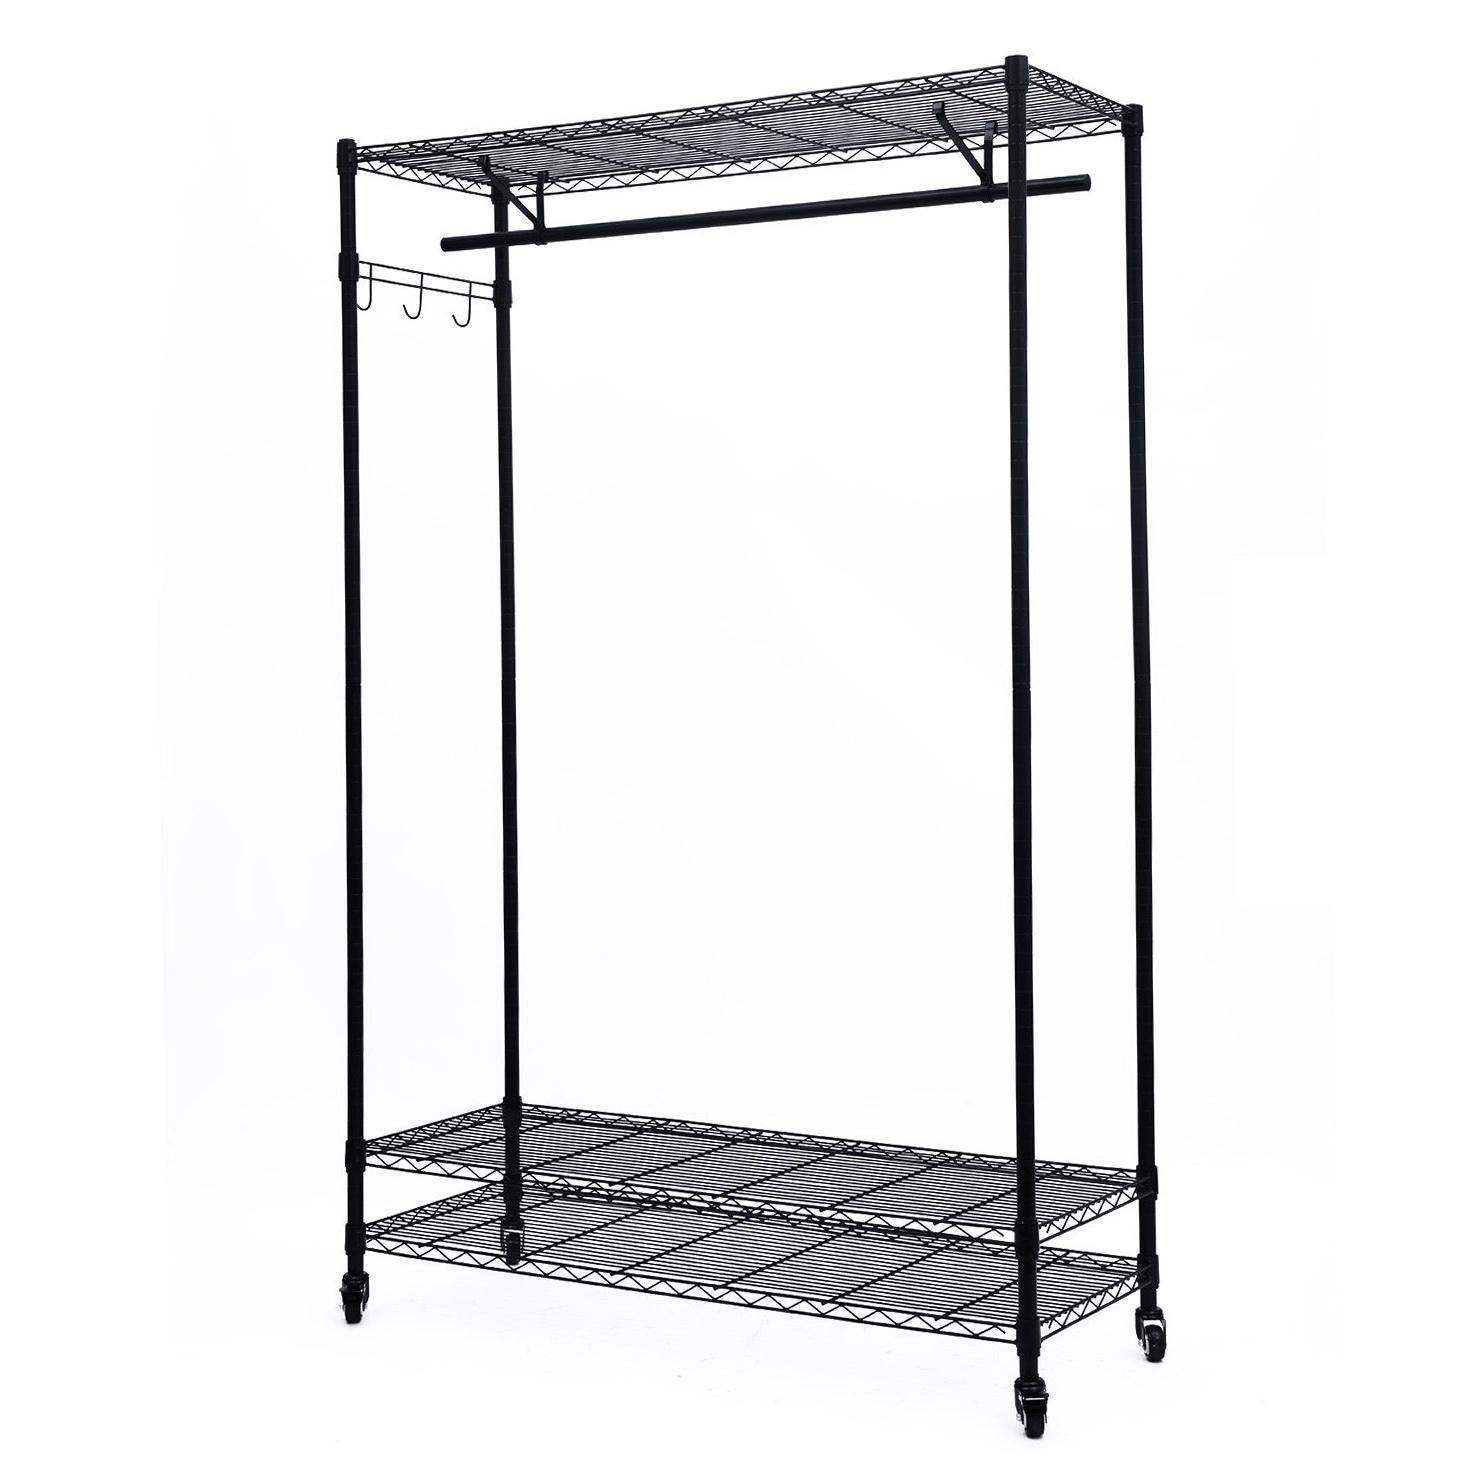 3 Shelf Hanging Closet Organizers